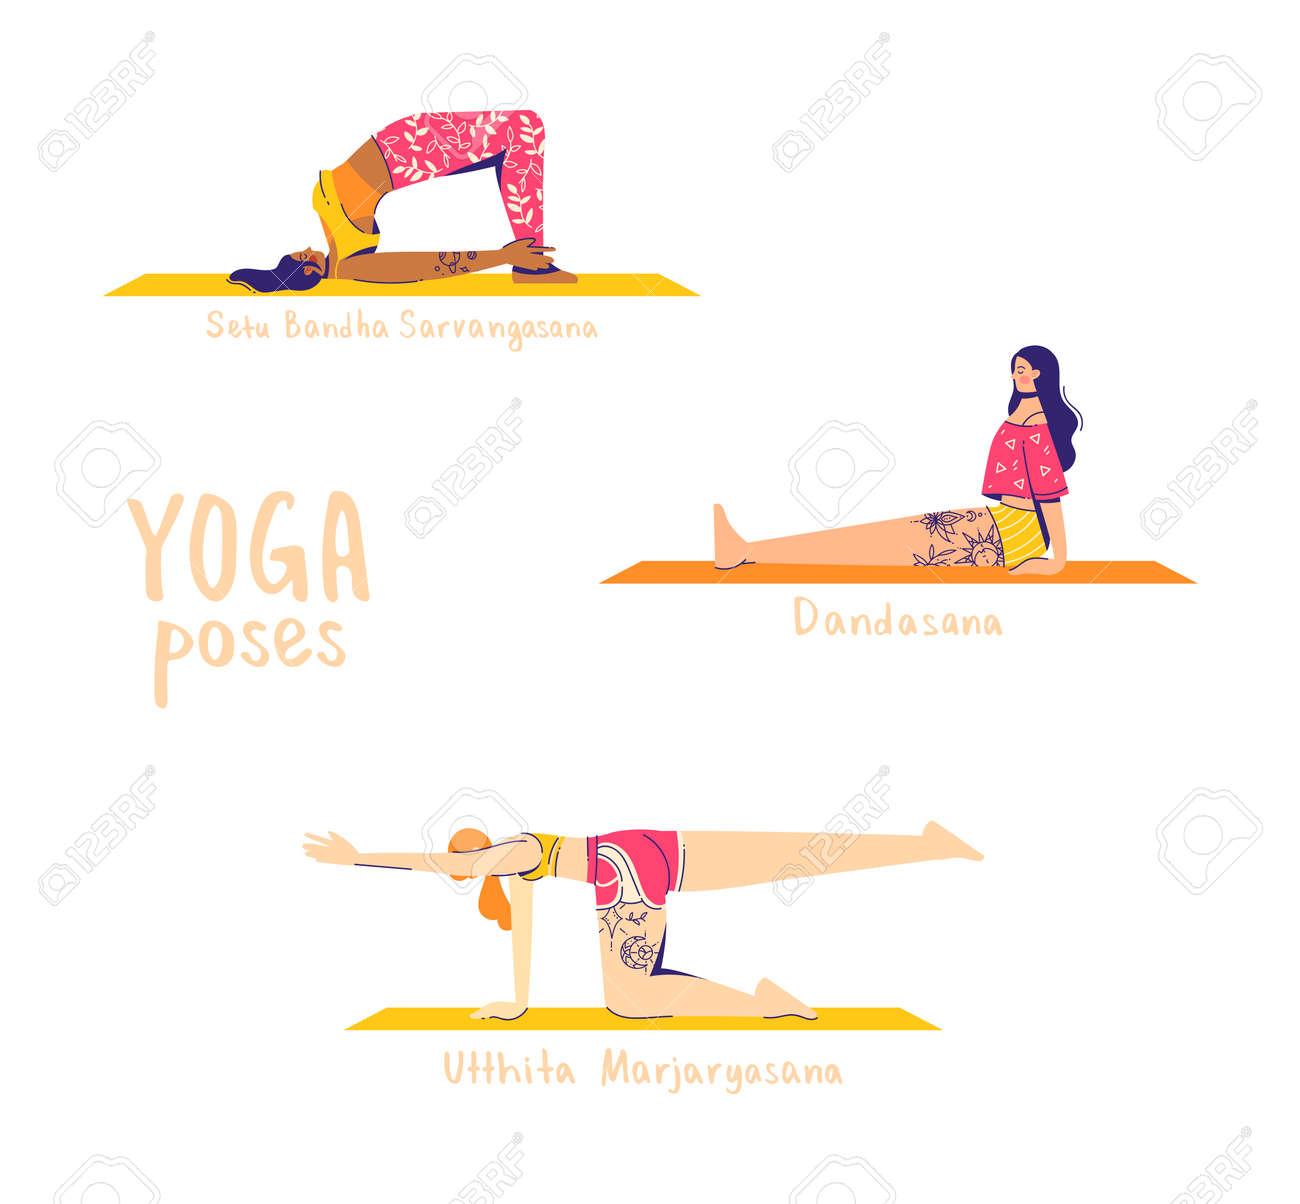 Set of yoga poses. Female characters practice yoga. Yoga concept. 'yoga poses' sign. Modern flat style vector illustration isolated on white background. - 149978200